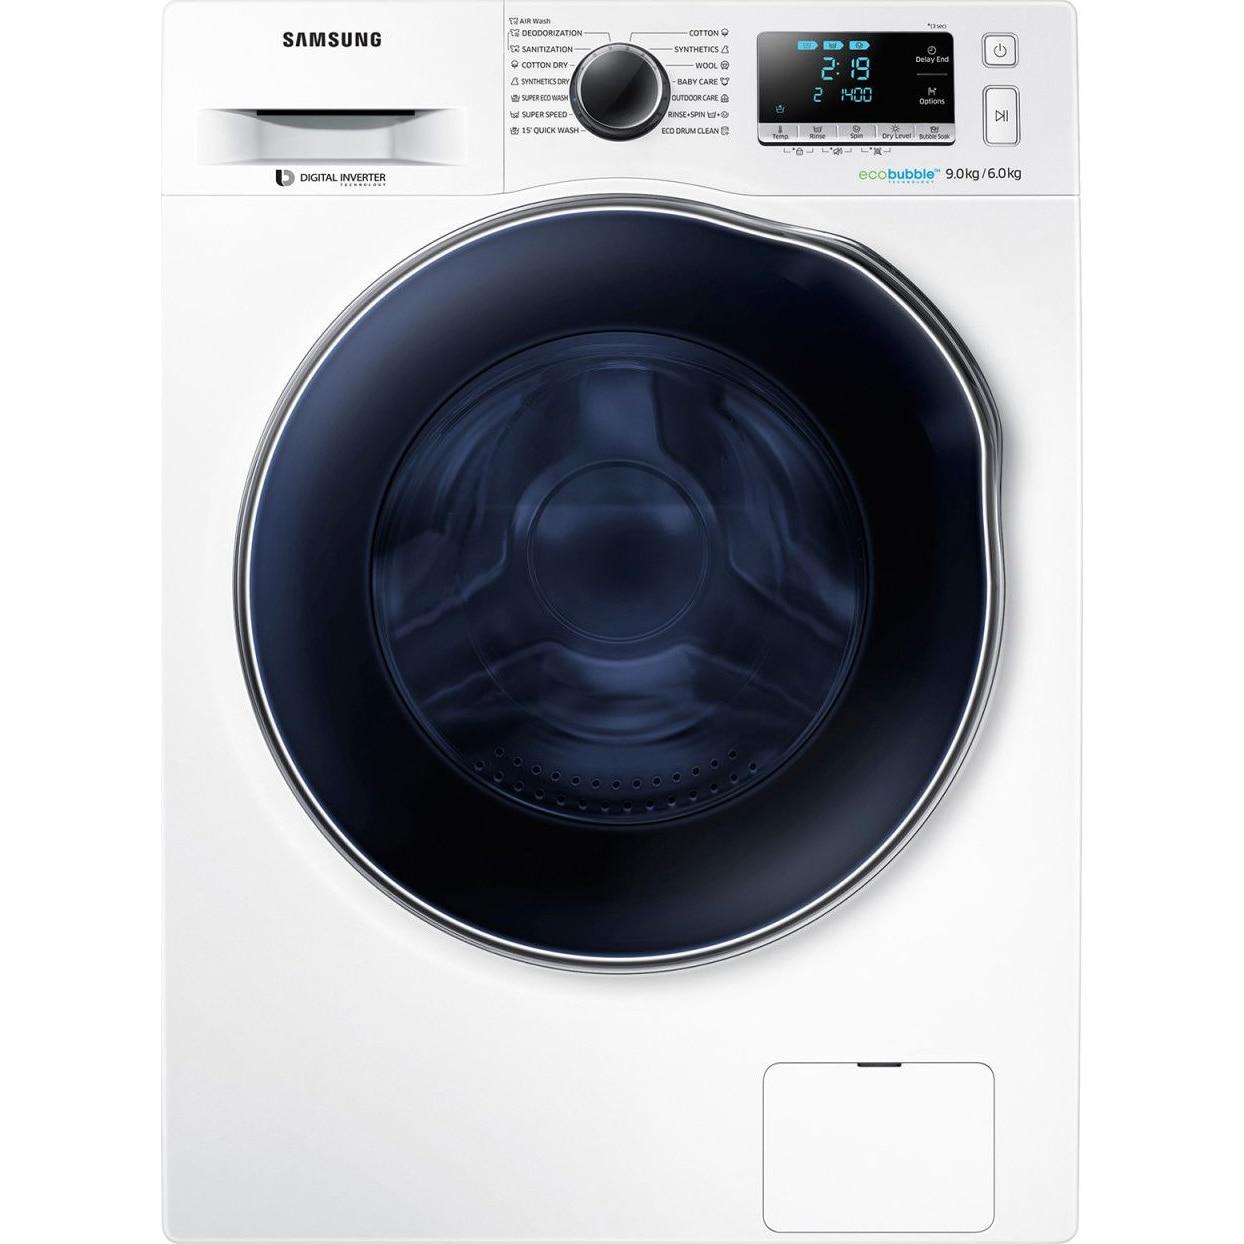 Fotografie Masina de spalat rufe cu uscator Samsung WD90J6A10AW/LE, 1400 RPM, 9kg spalare / 6kg uscare, Clasa A, Motor Digital Inverter, EcoBubble, Alb